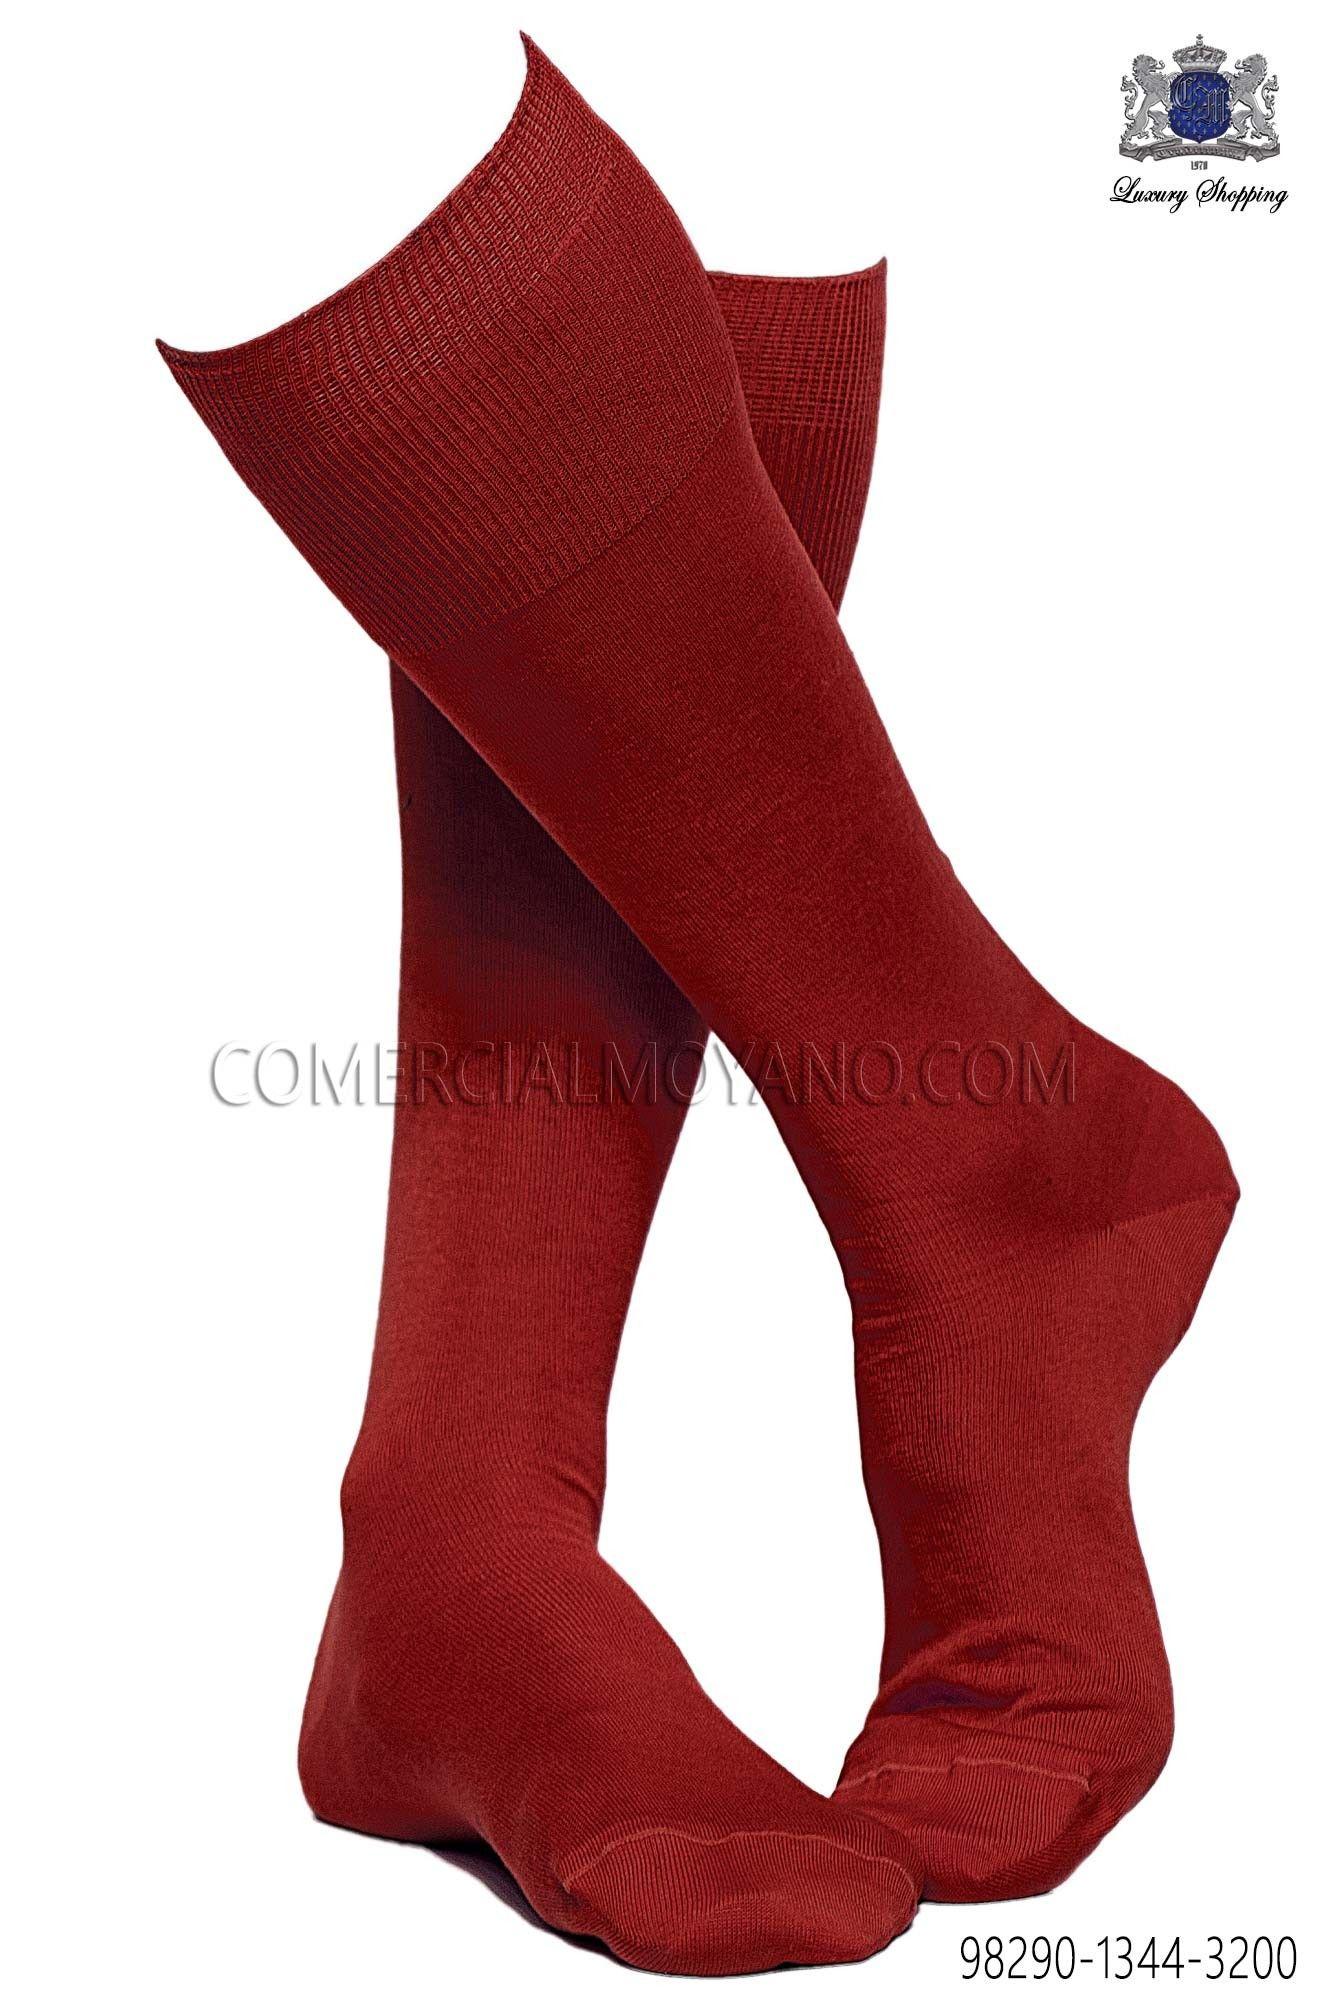 Calcetín rojo alto 100% algodón hilo de Escocia, Ottavio Nuccio Gala.